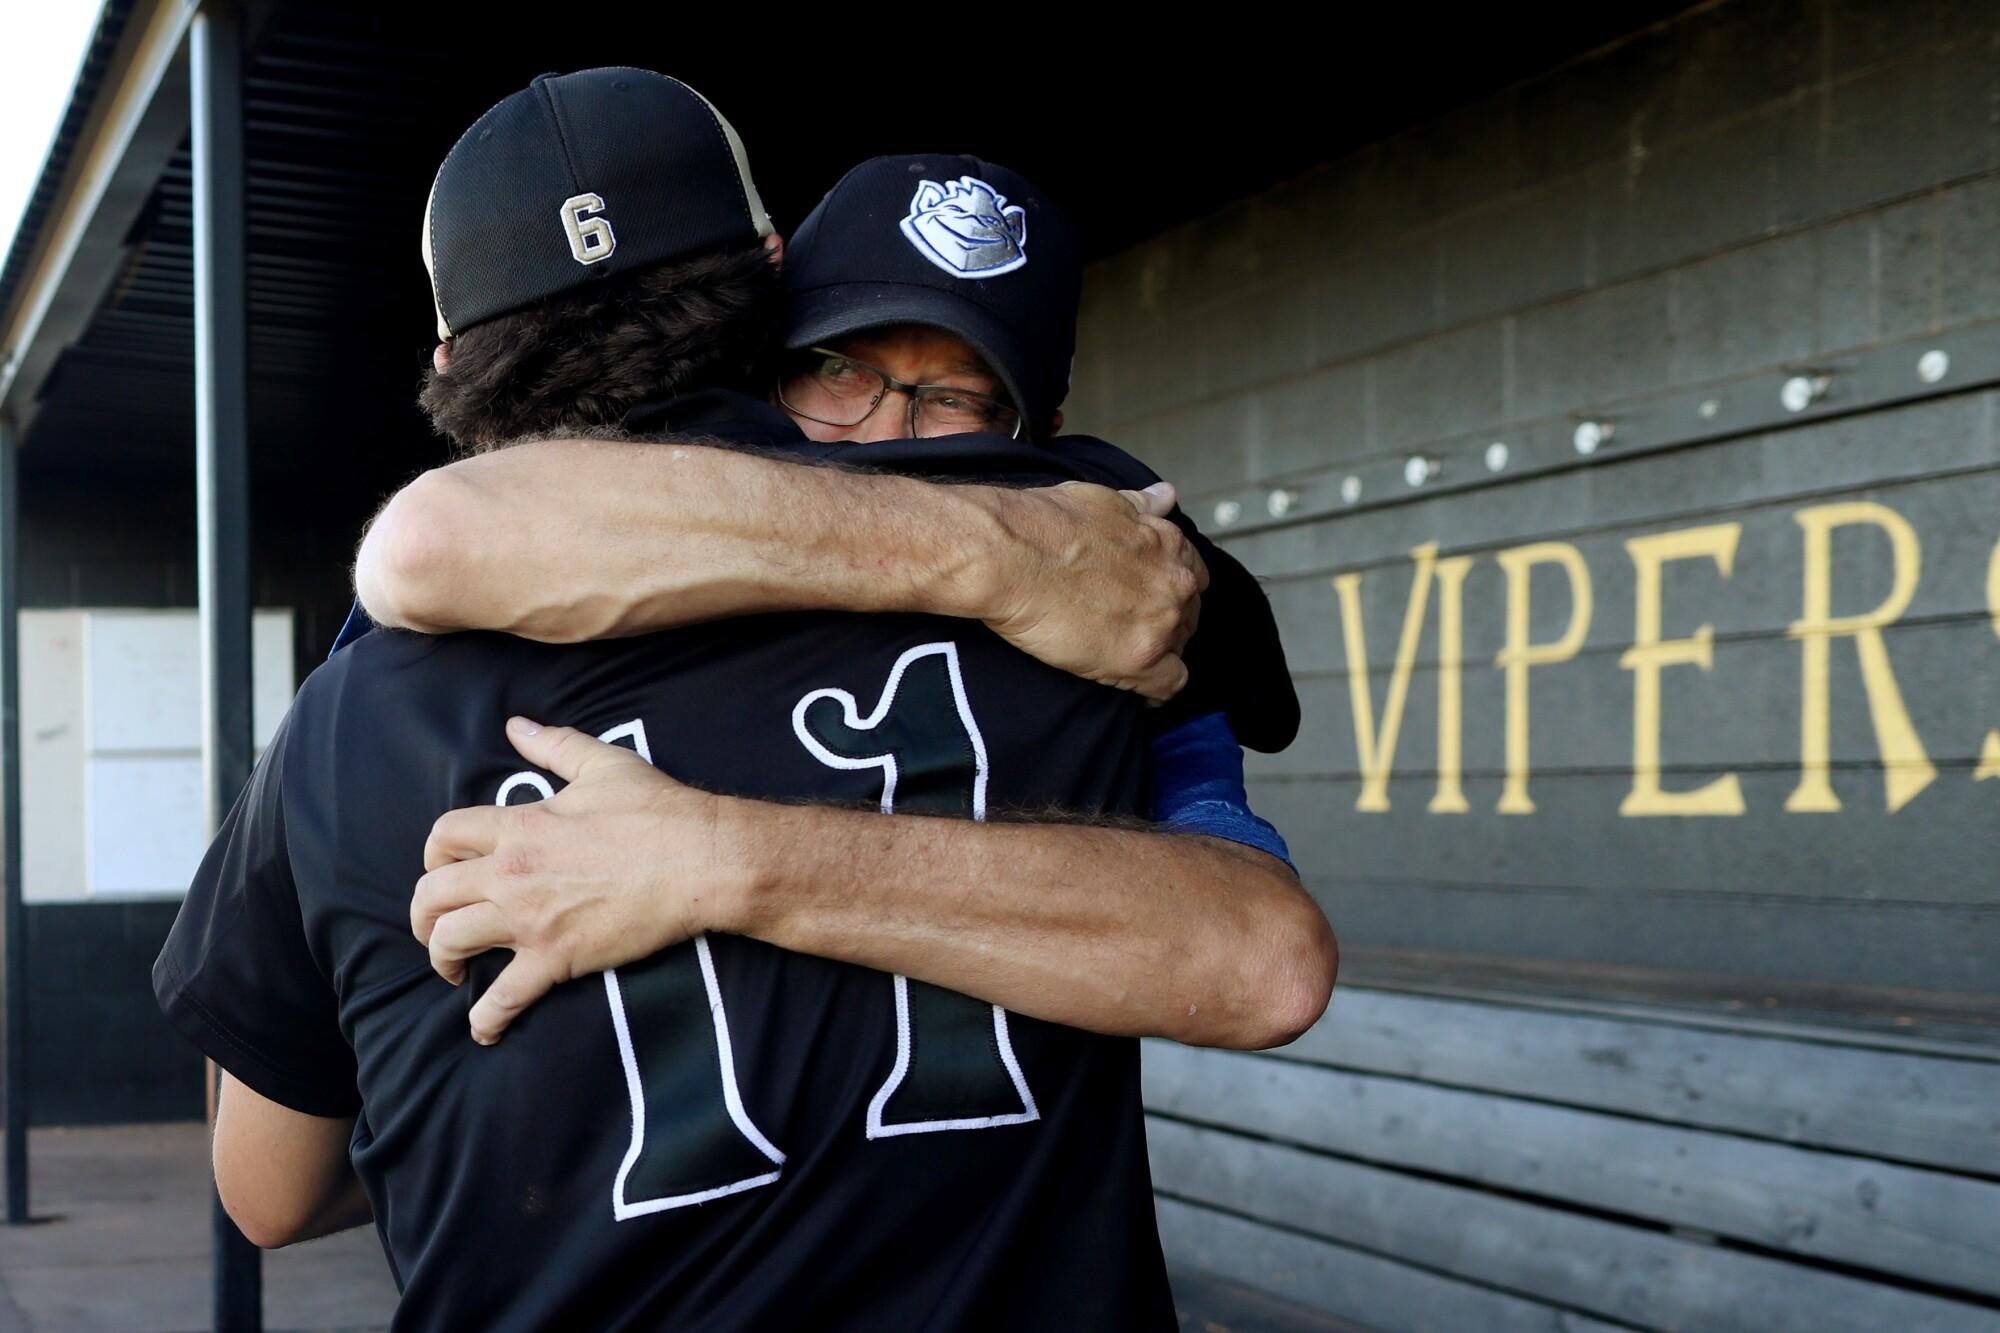 Tanner Spallina, a catcher on the Verrado High School baseball team, hugs Daryl McKinsey at the school in Buckeye, Ariz.